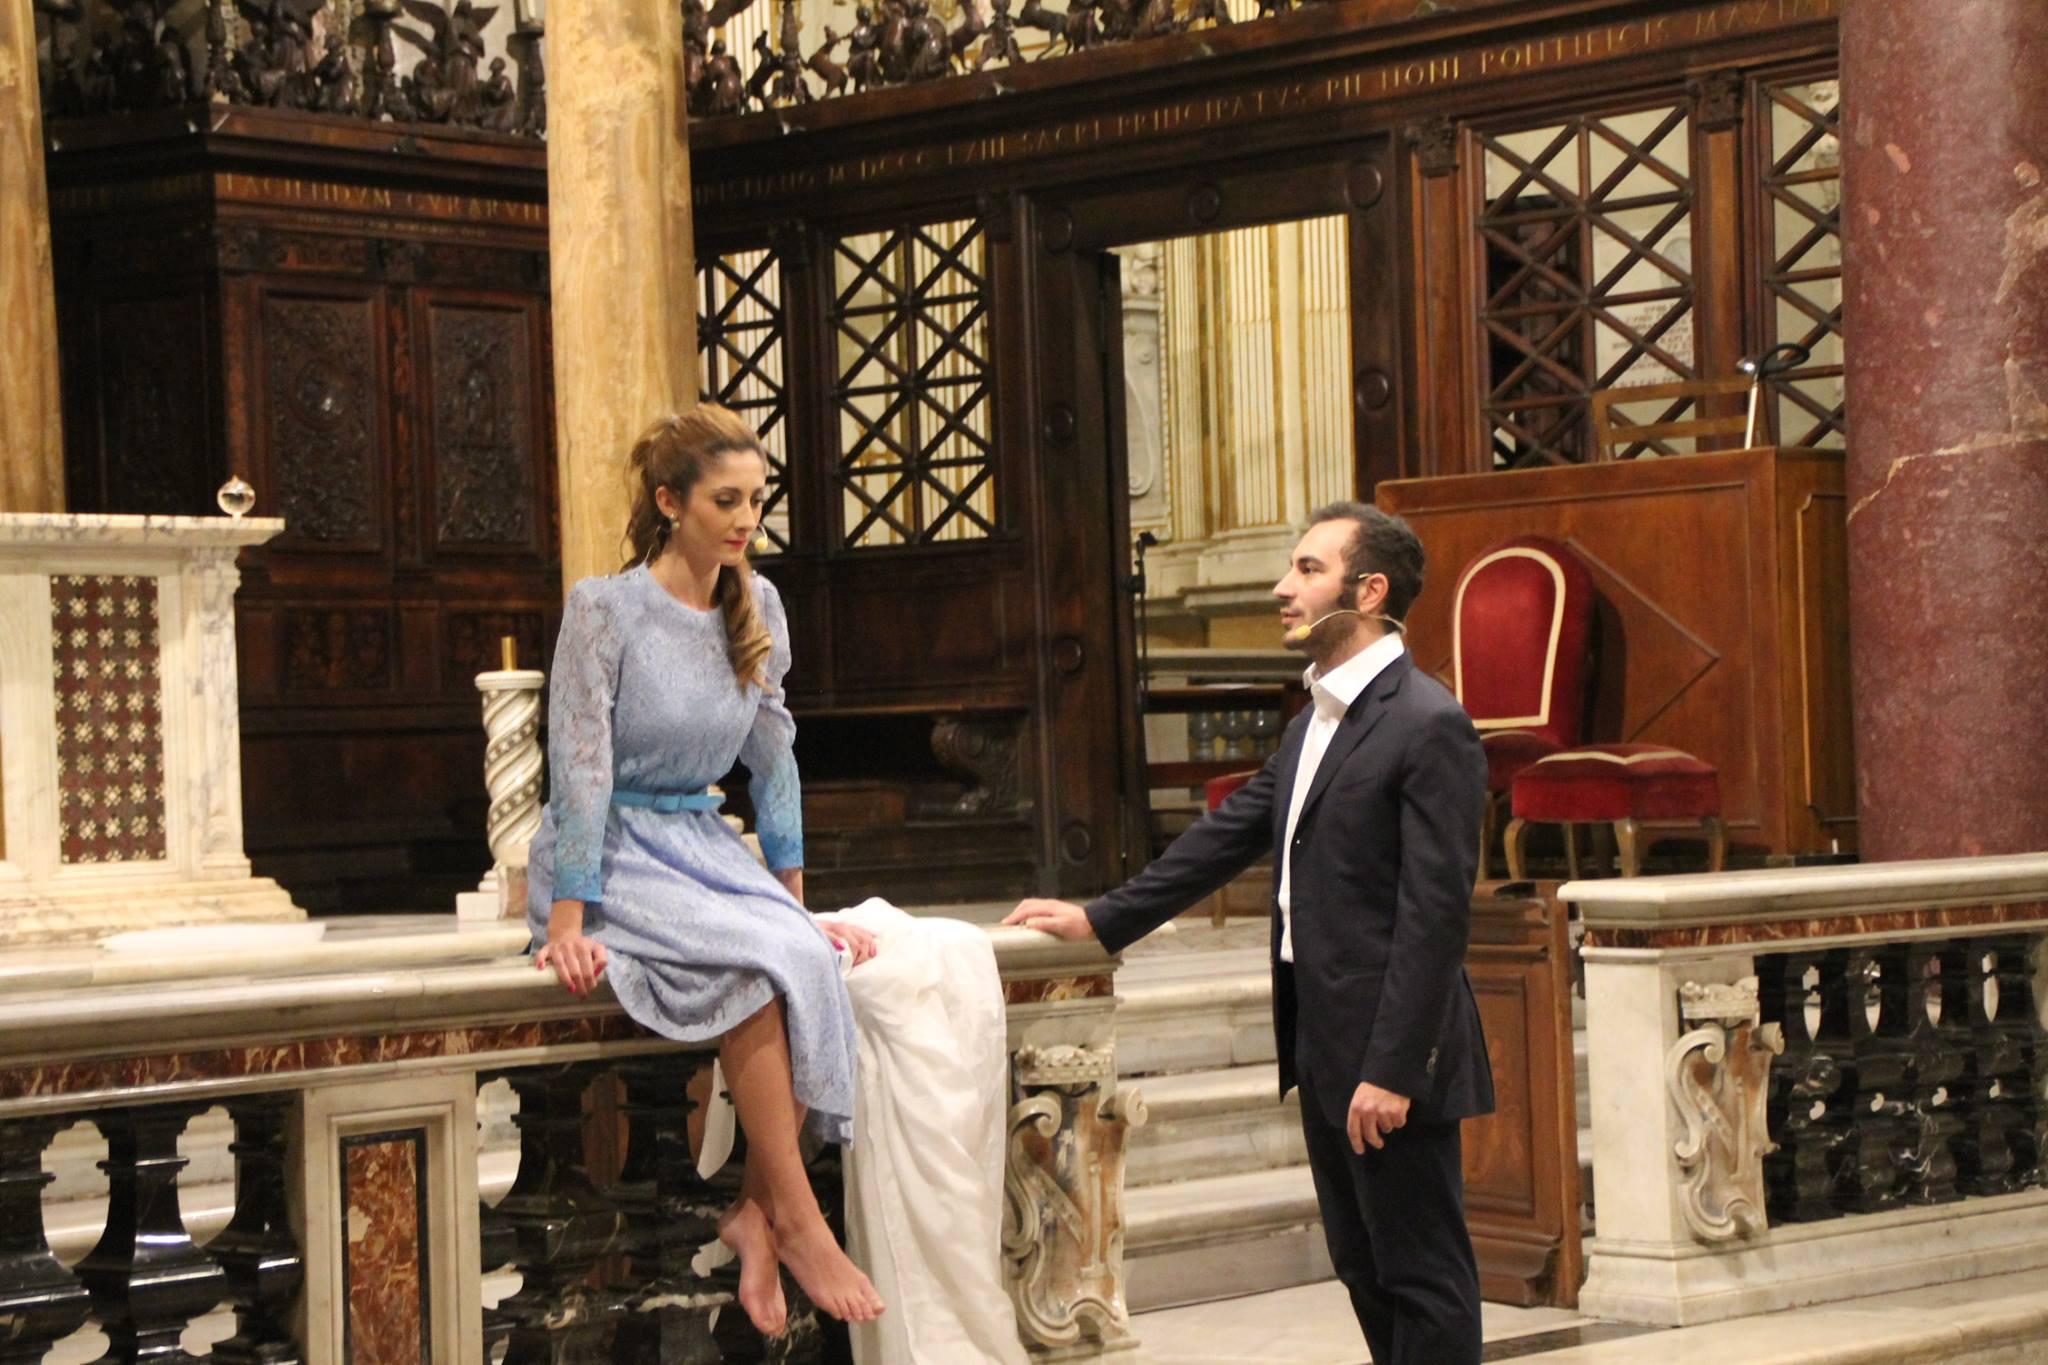 """La bottega dell'orefice"" play by Karol Wojtyla directed by Antonio Tarallo"